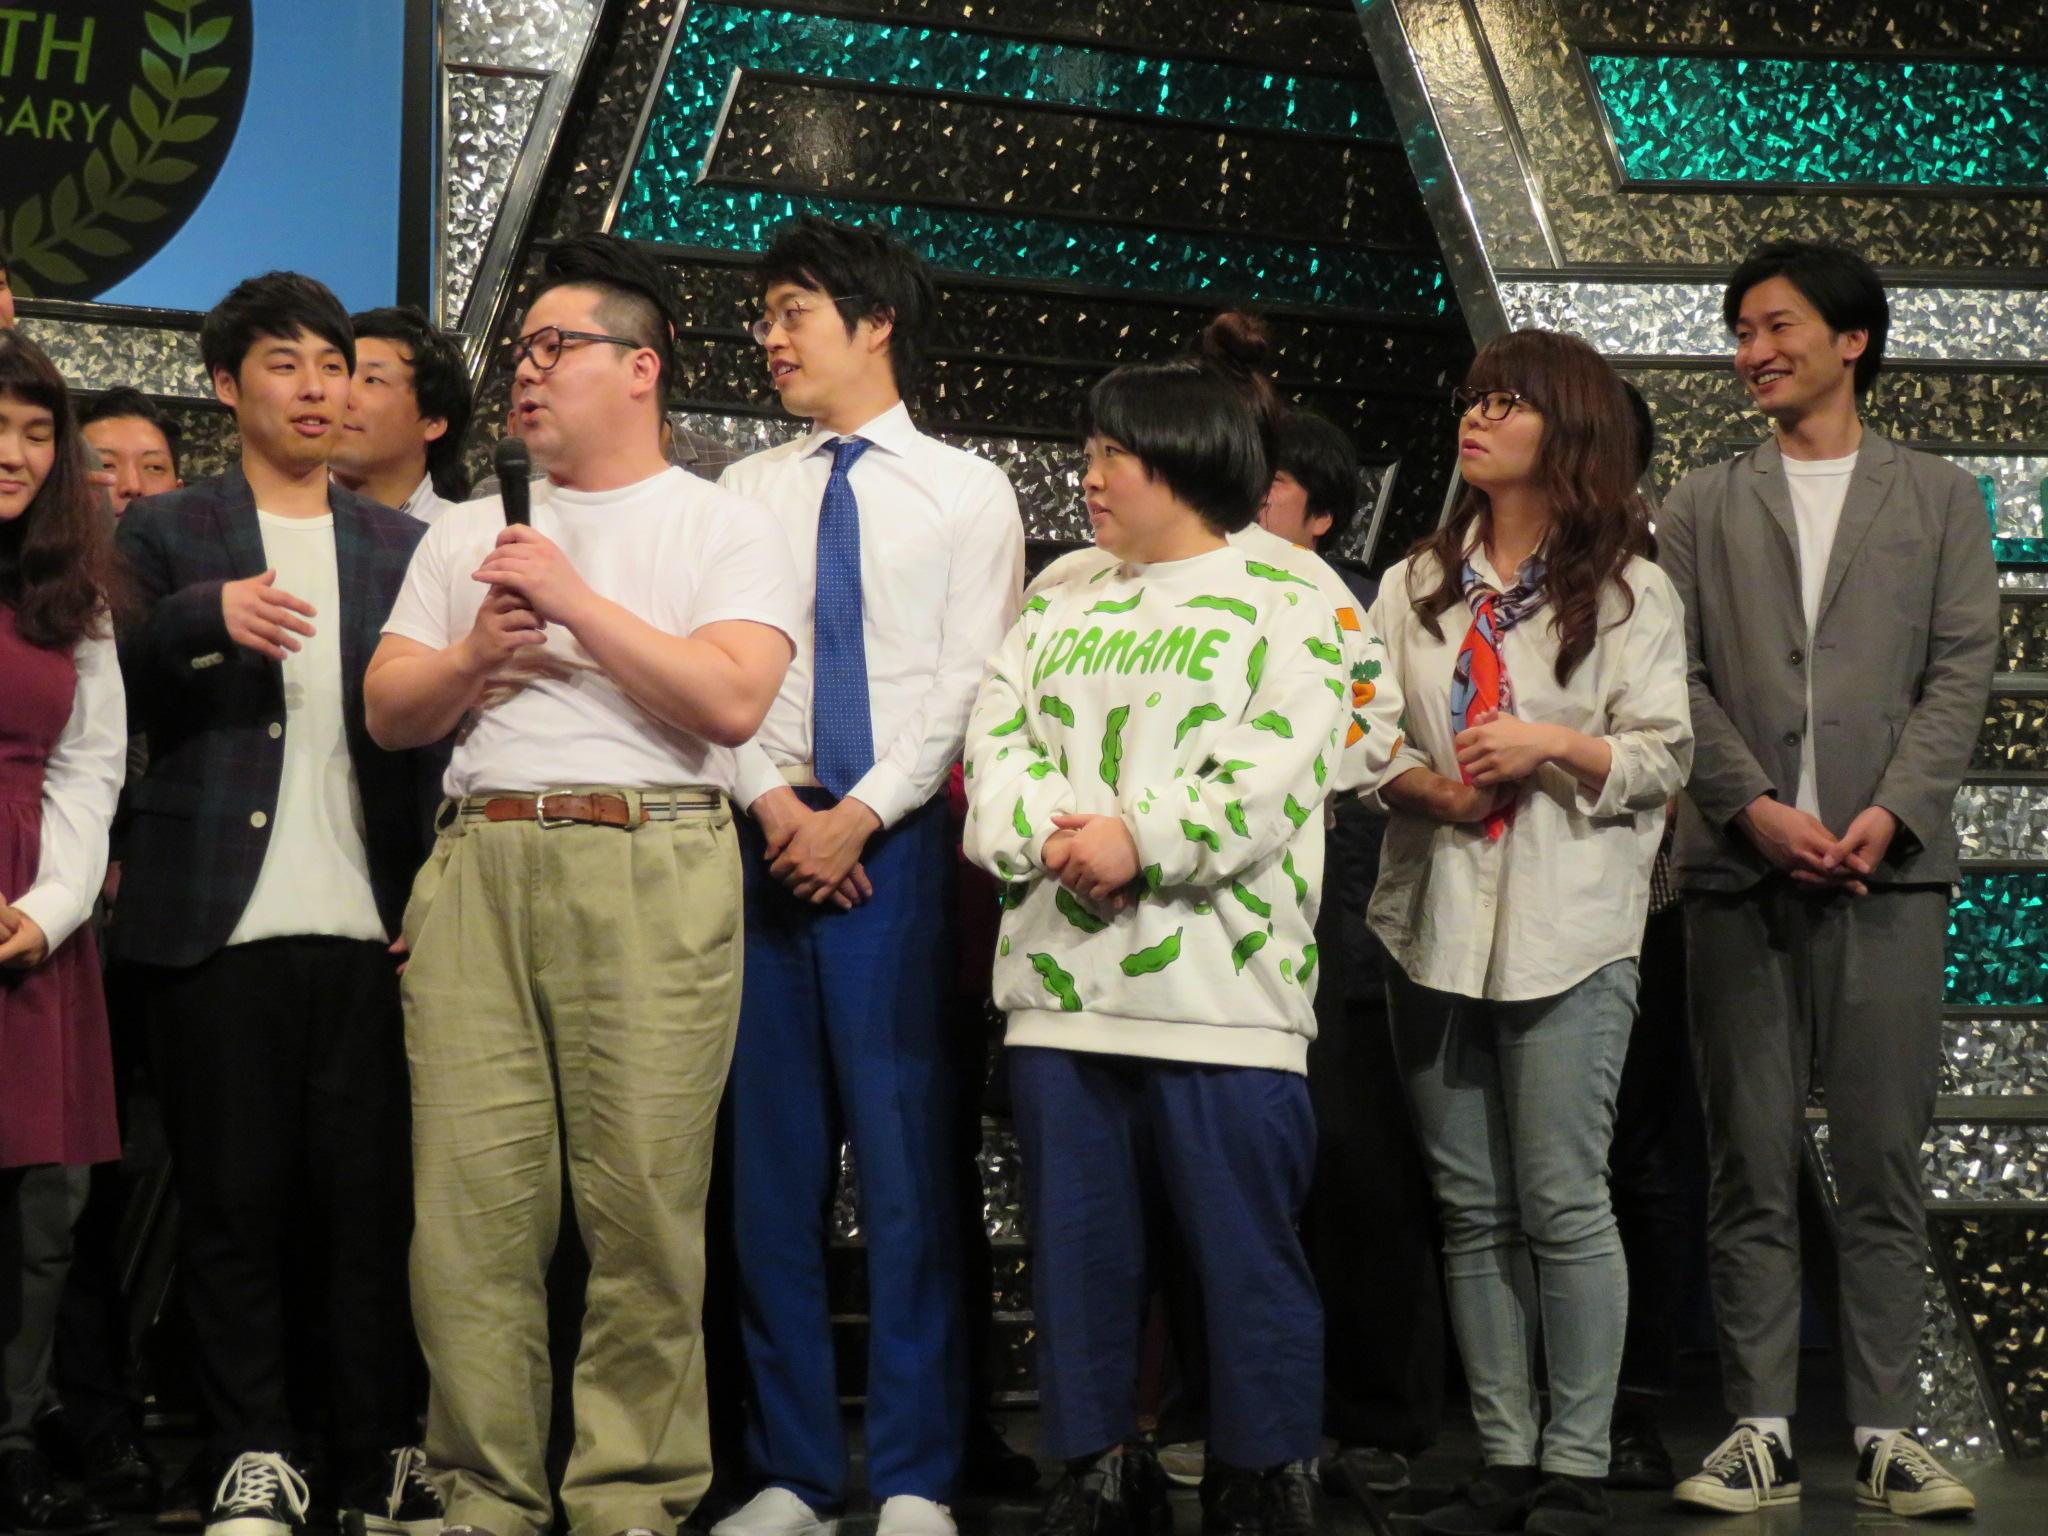 http://news.yoshimoto.co.jp/20180326005030-6ee7bf82faead3568557c981ec31e5a4b05407b8.jpg